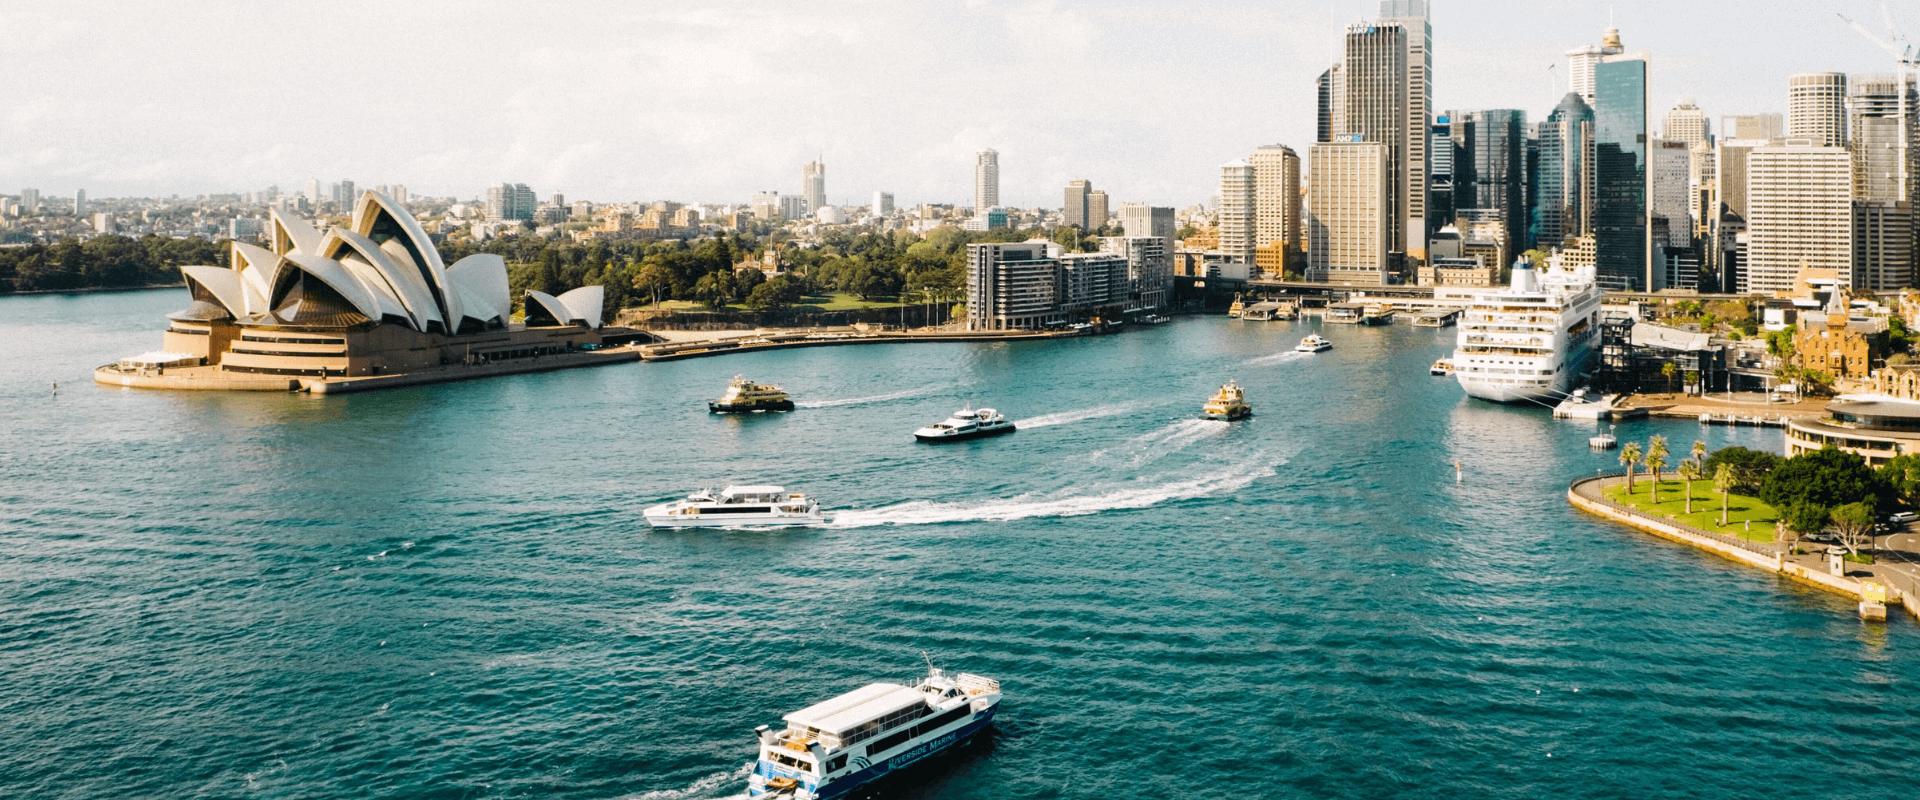 Financial Advisor Sydney - Wealthy Self Financial Planning - Financial Planning for Millennials - Sydney View